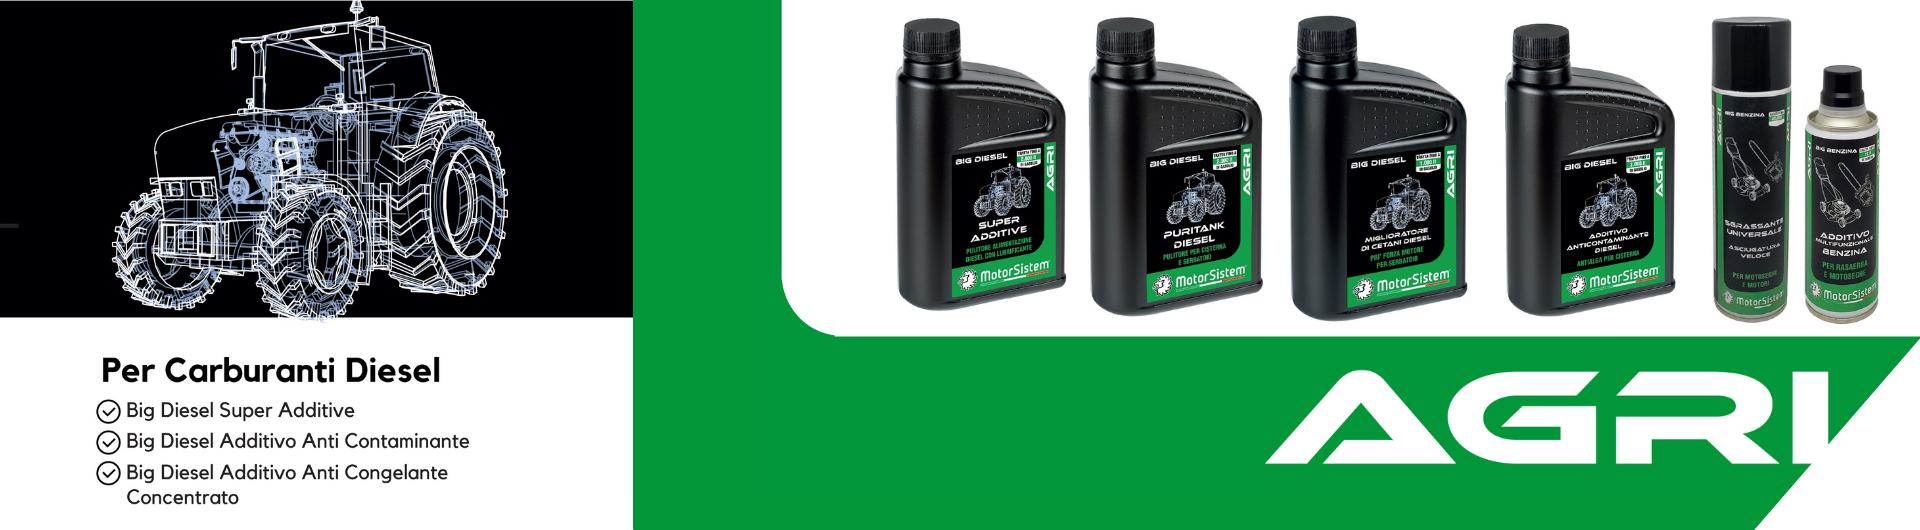 AGRI | Linea di additivi per motori diesel di macchine movimento terra